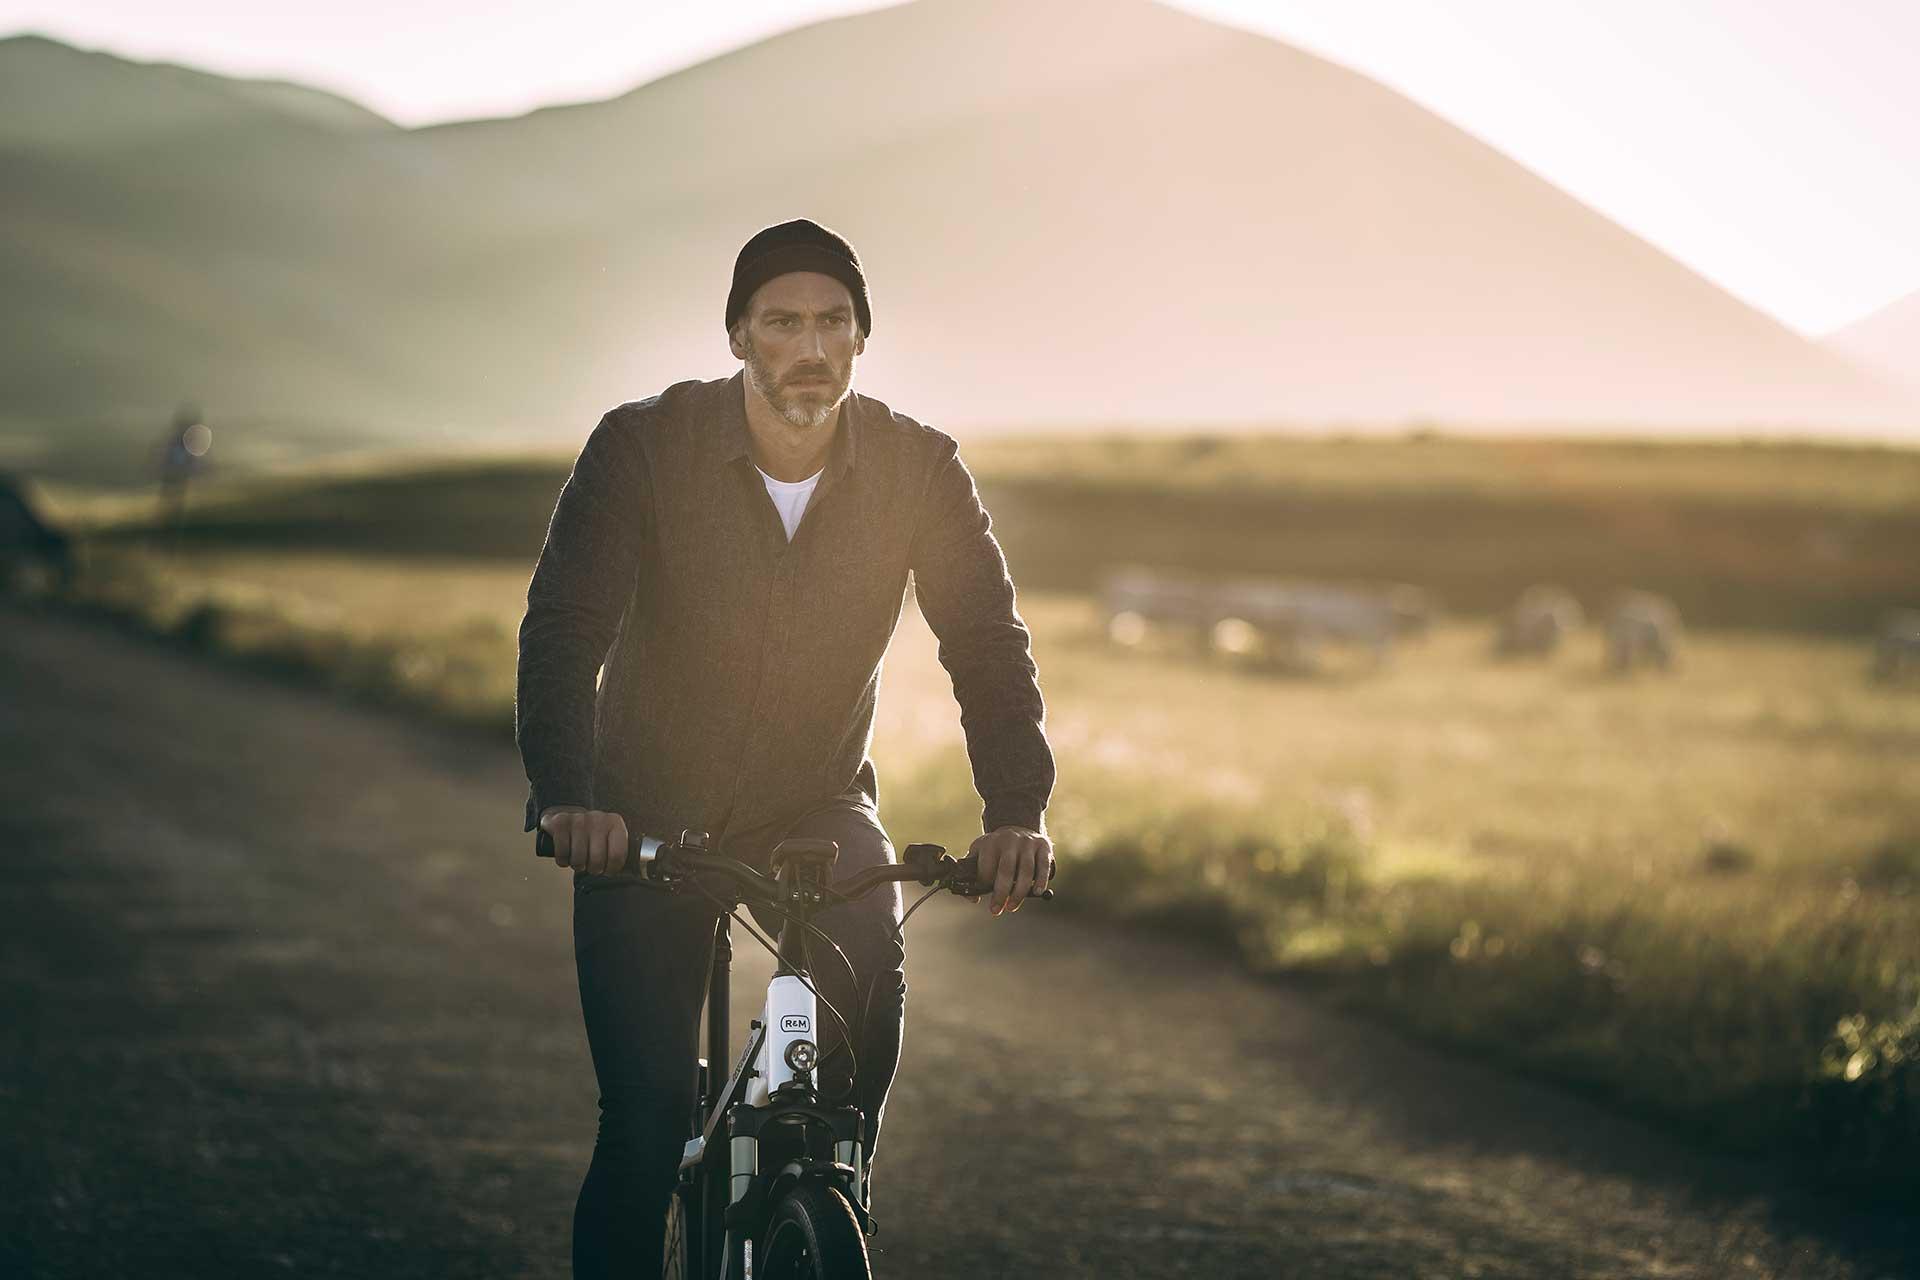 Fotograf People Portrait Bike Lifestyle Sport Fotoproduktion